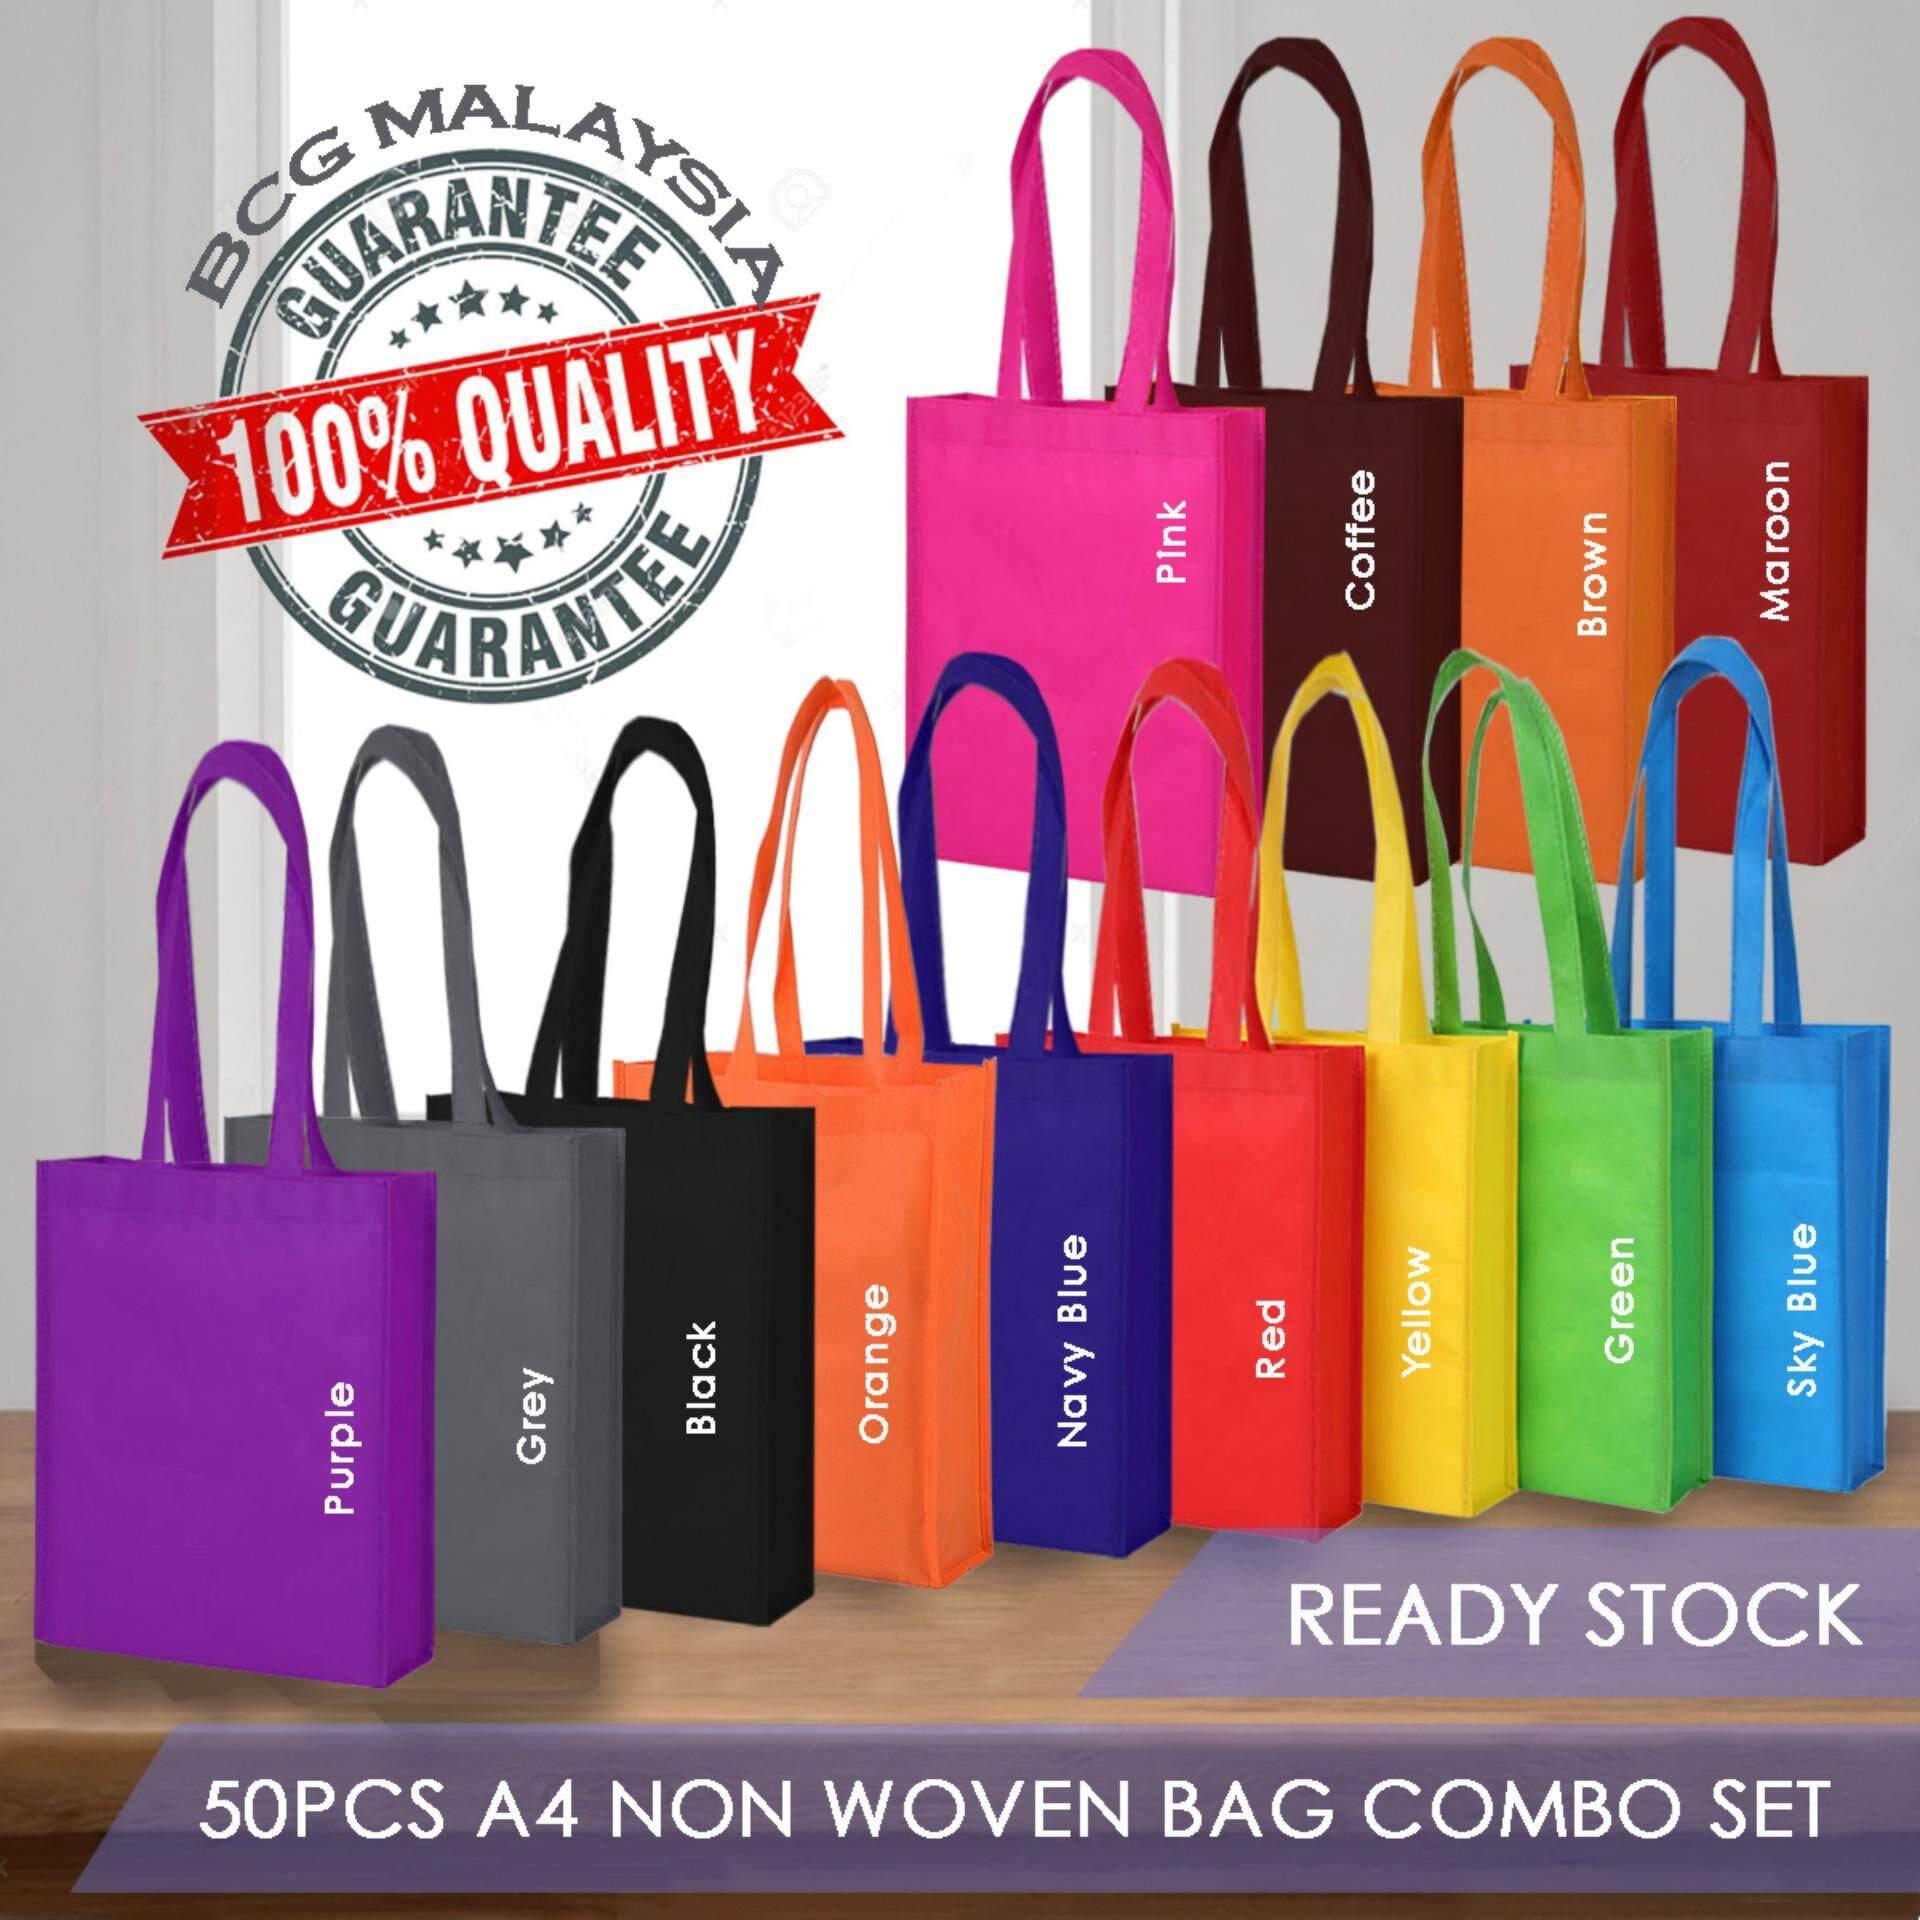 [Ready Stock] BCG Malaysia 50 PCS A4 Non Woven Recycle Bags Combo Set